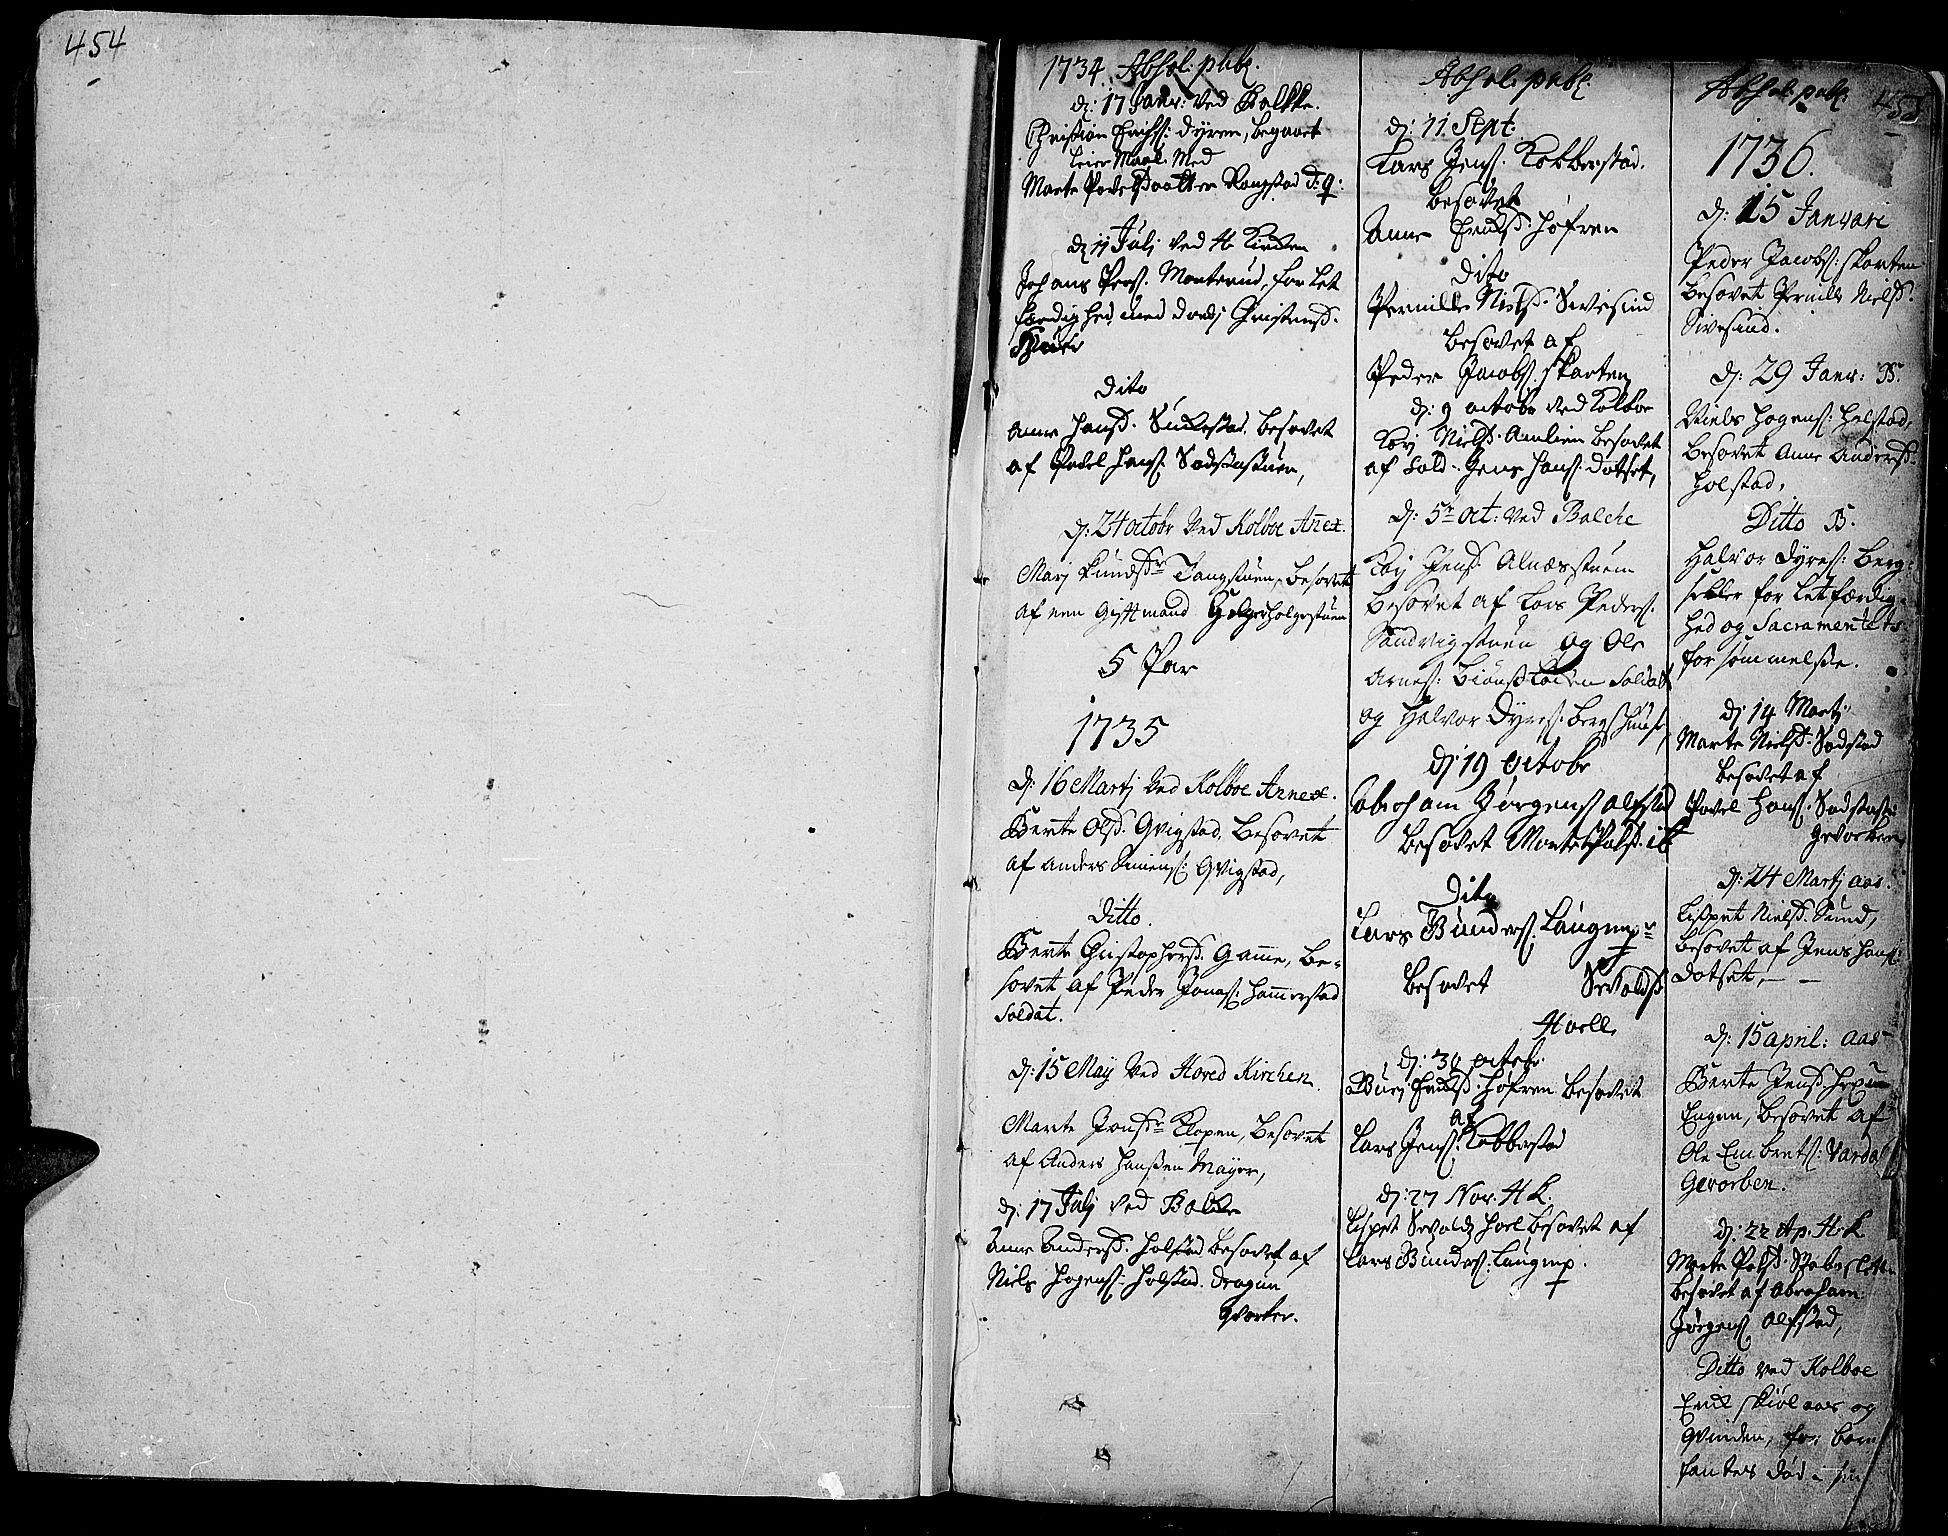 SAH, Toten prestekontor, Ministerialbok nr. 3, 1734-1751, s. 454-455